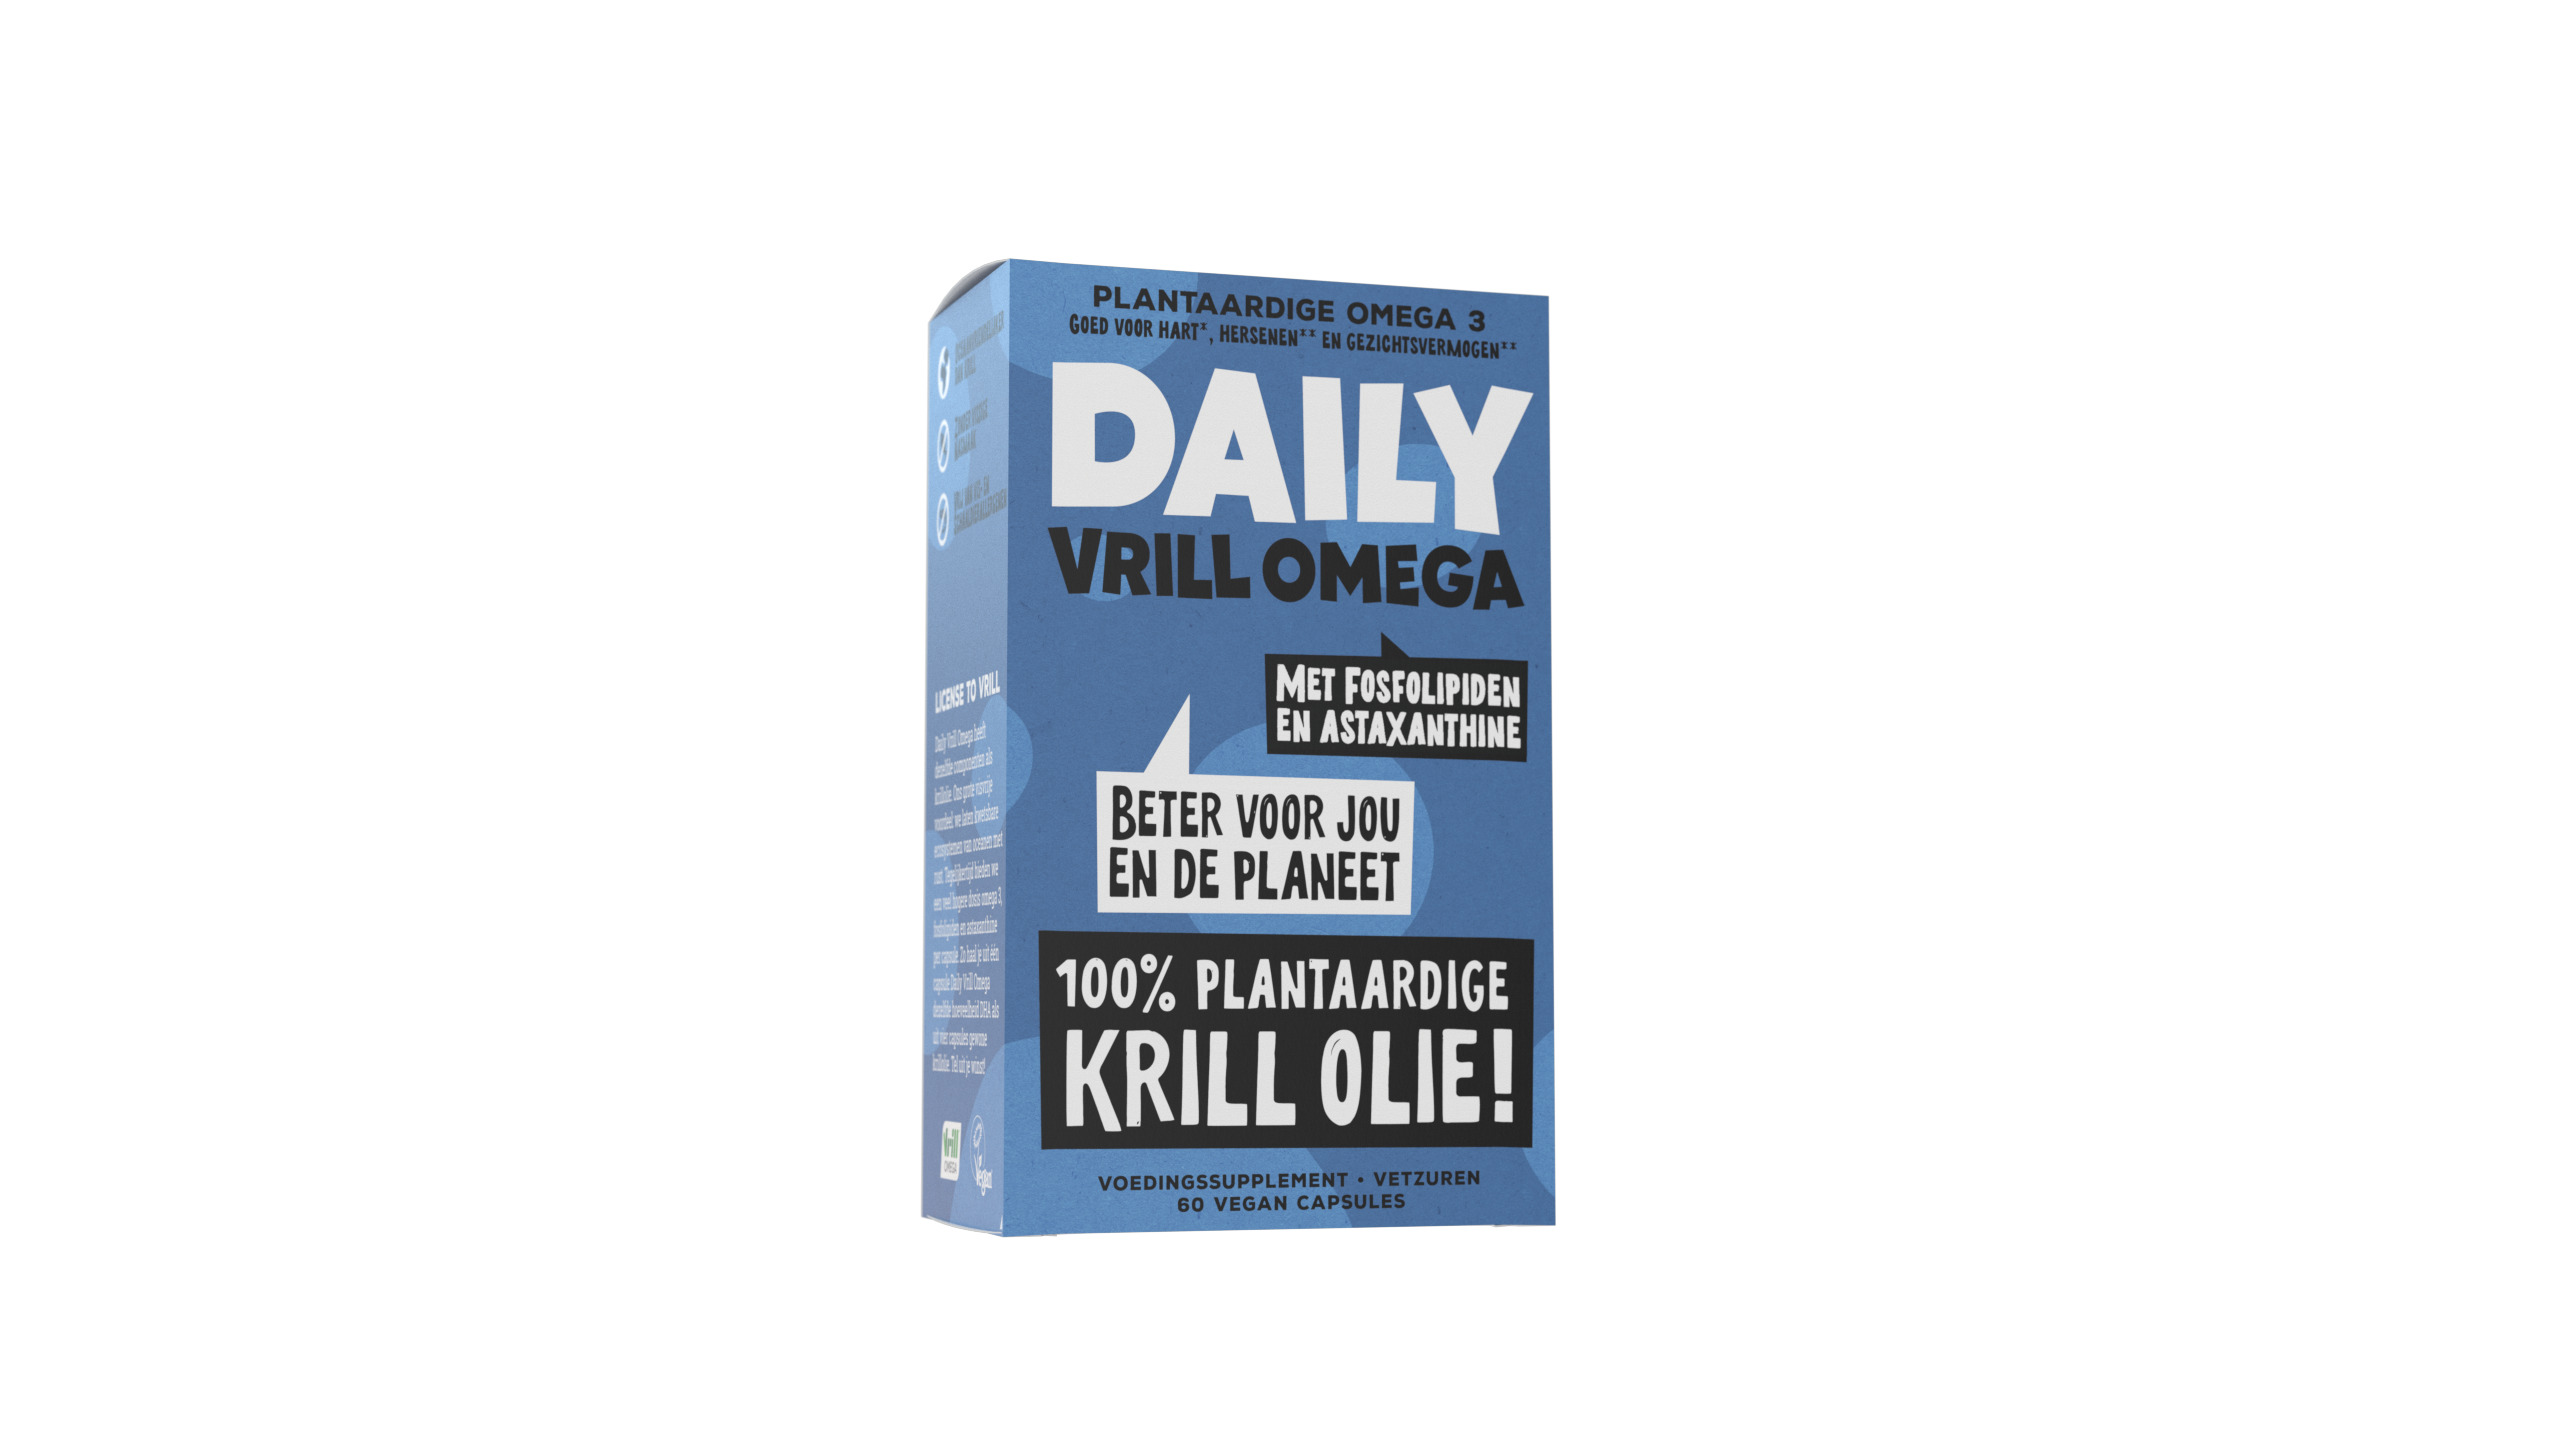 daily vrill omega